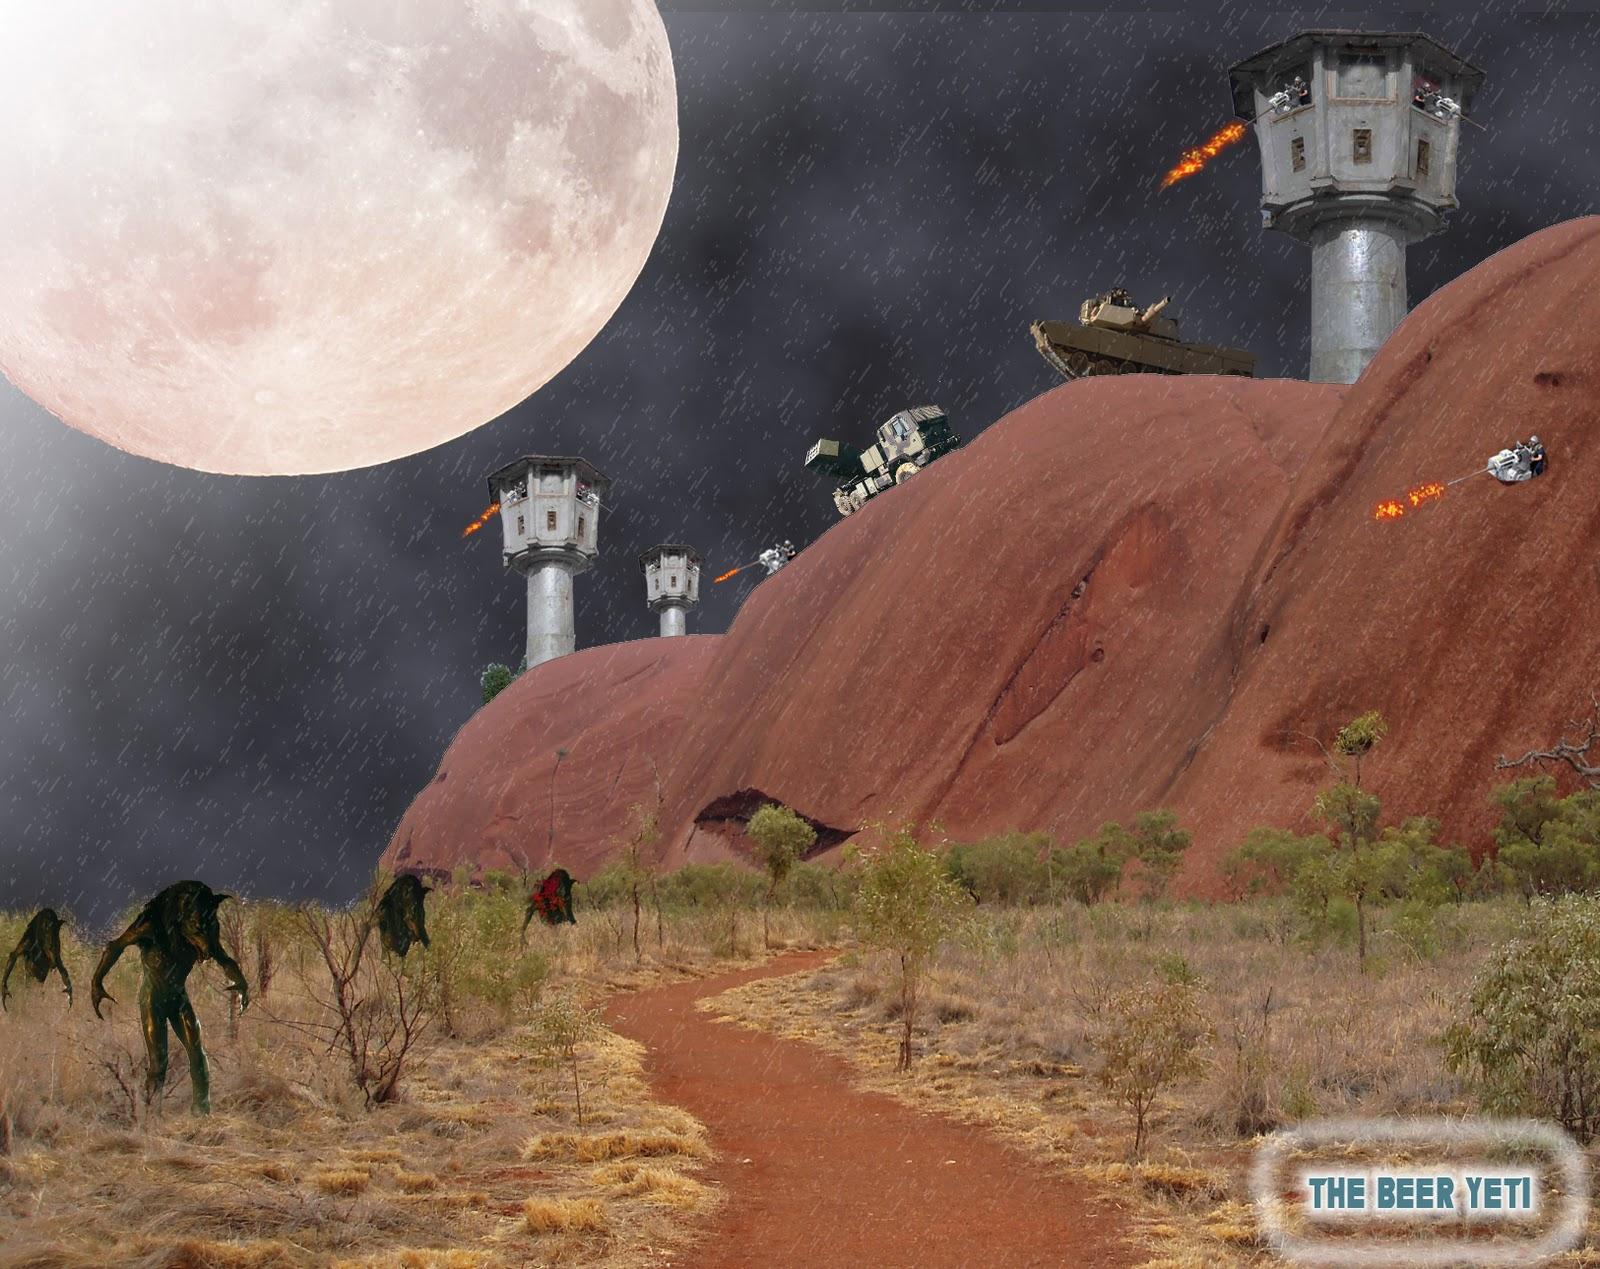 http://4.bp.blogspot.com/_De3HUQ-A6EA/TUrQ8jaOlBI/AAAAAAAAByc/1VQyJow6B1g/s1600/ayers+rocks+image.jpg+%25287%2529.jpg